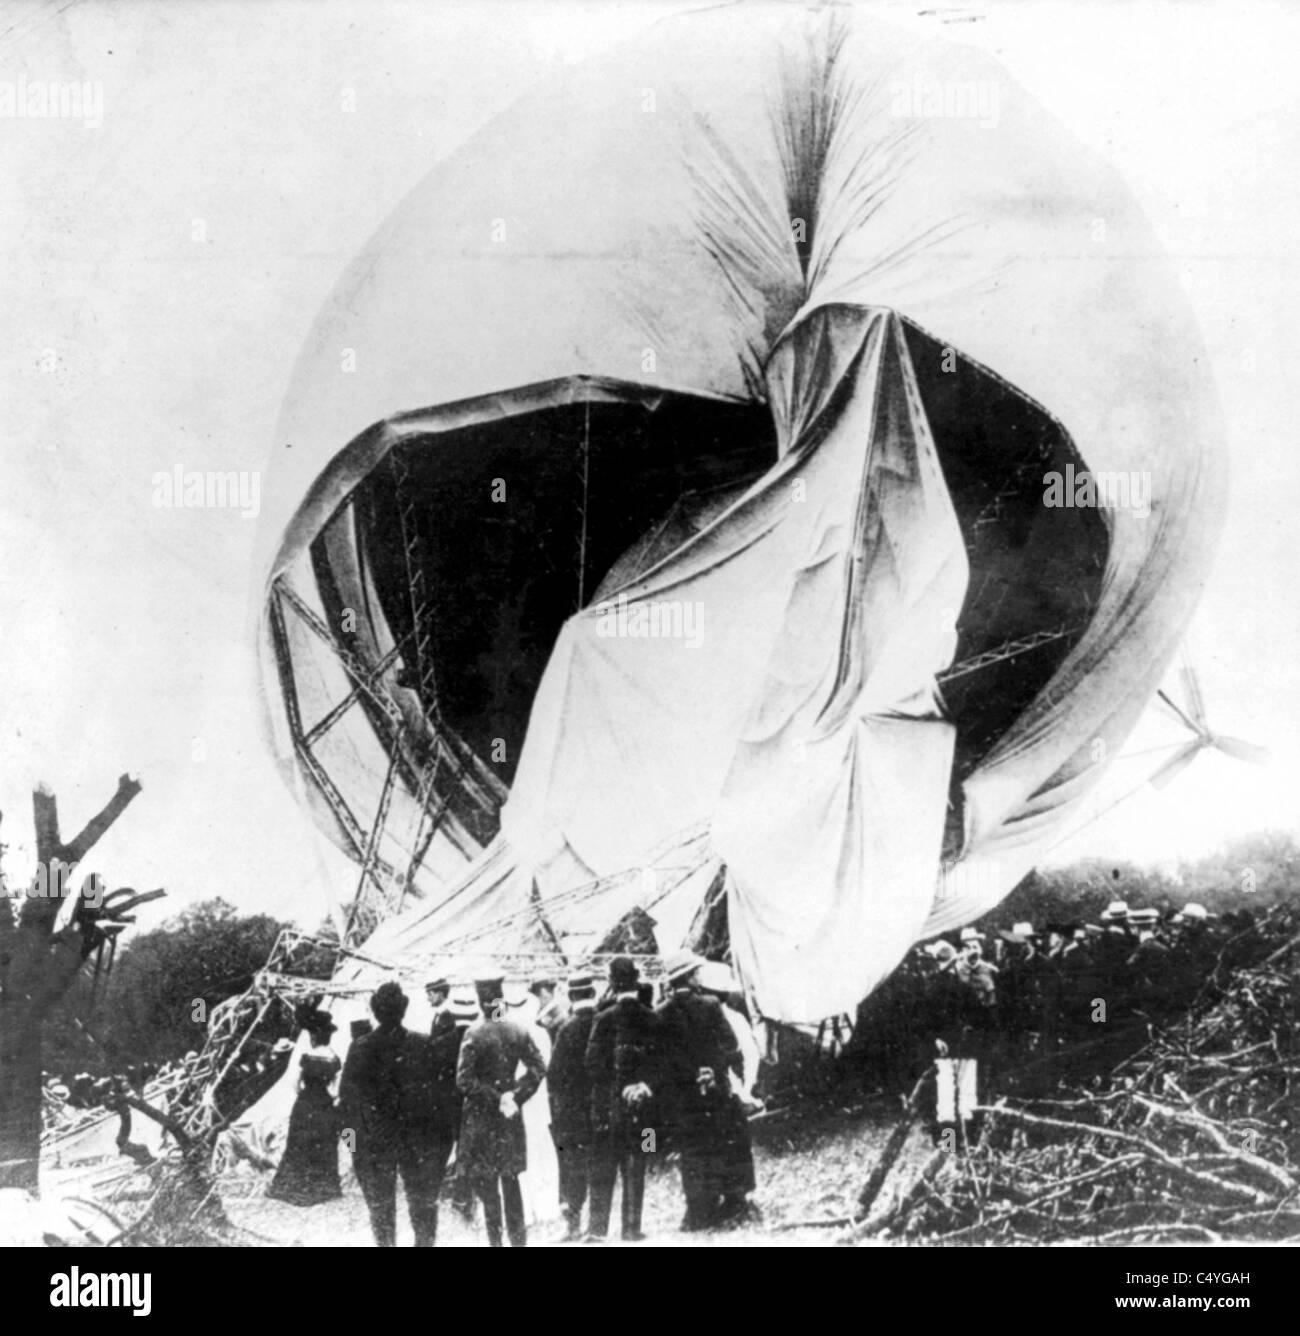 Wreck of German airship Stock Photo